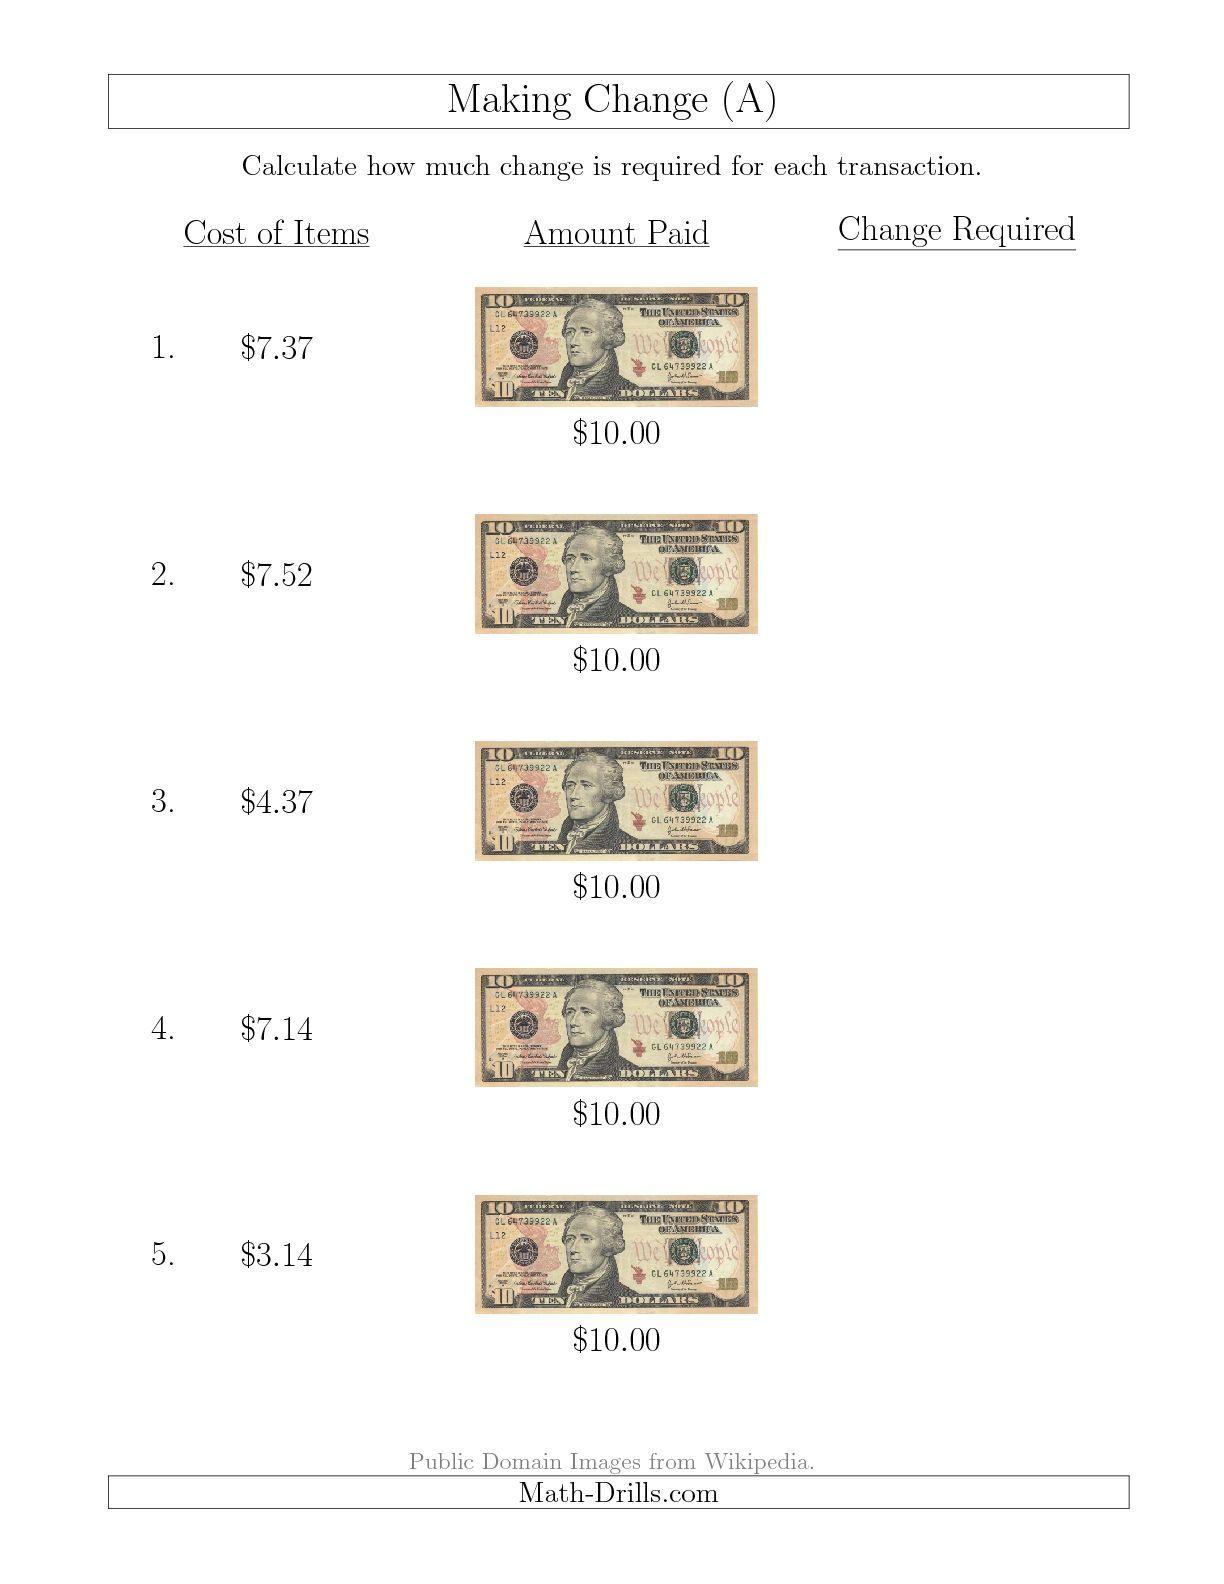 The Making Change From U S 10 Bills A Math Worksheet From The Money Worksheets Page At Math Drills Com Money Math Money Math Worksheets Money Worksheets